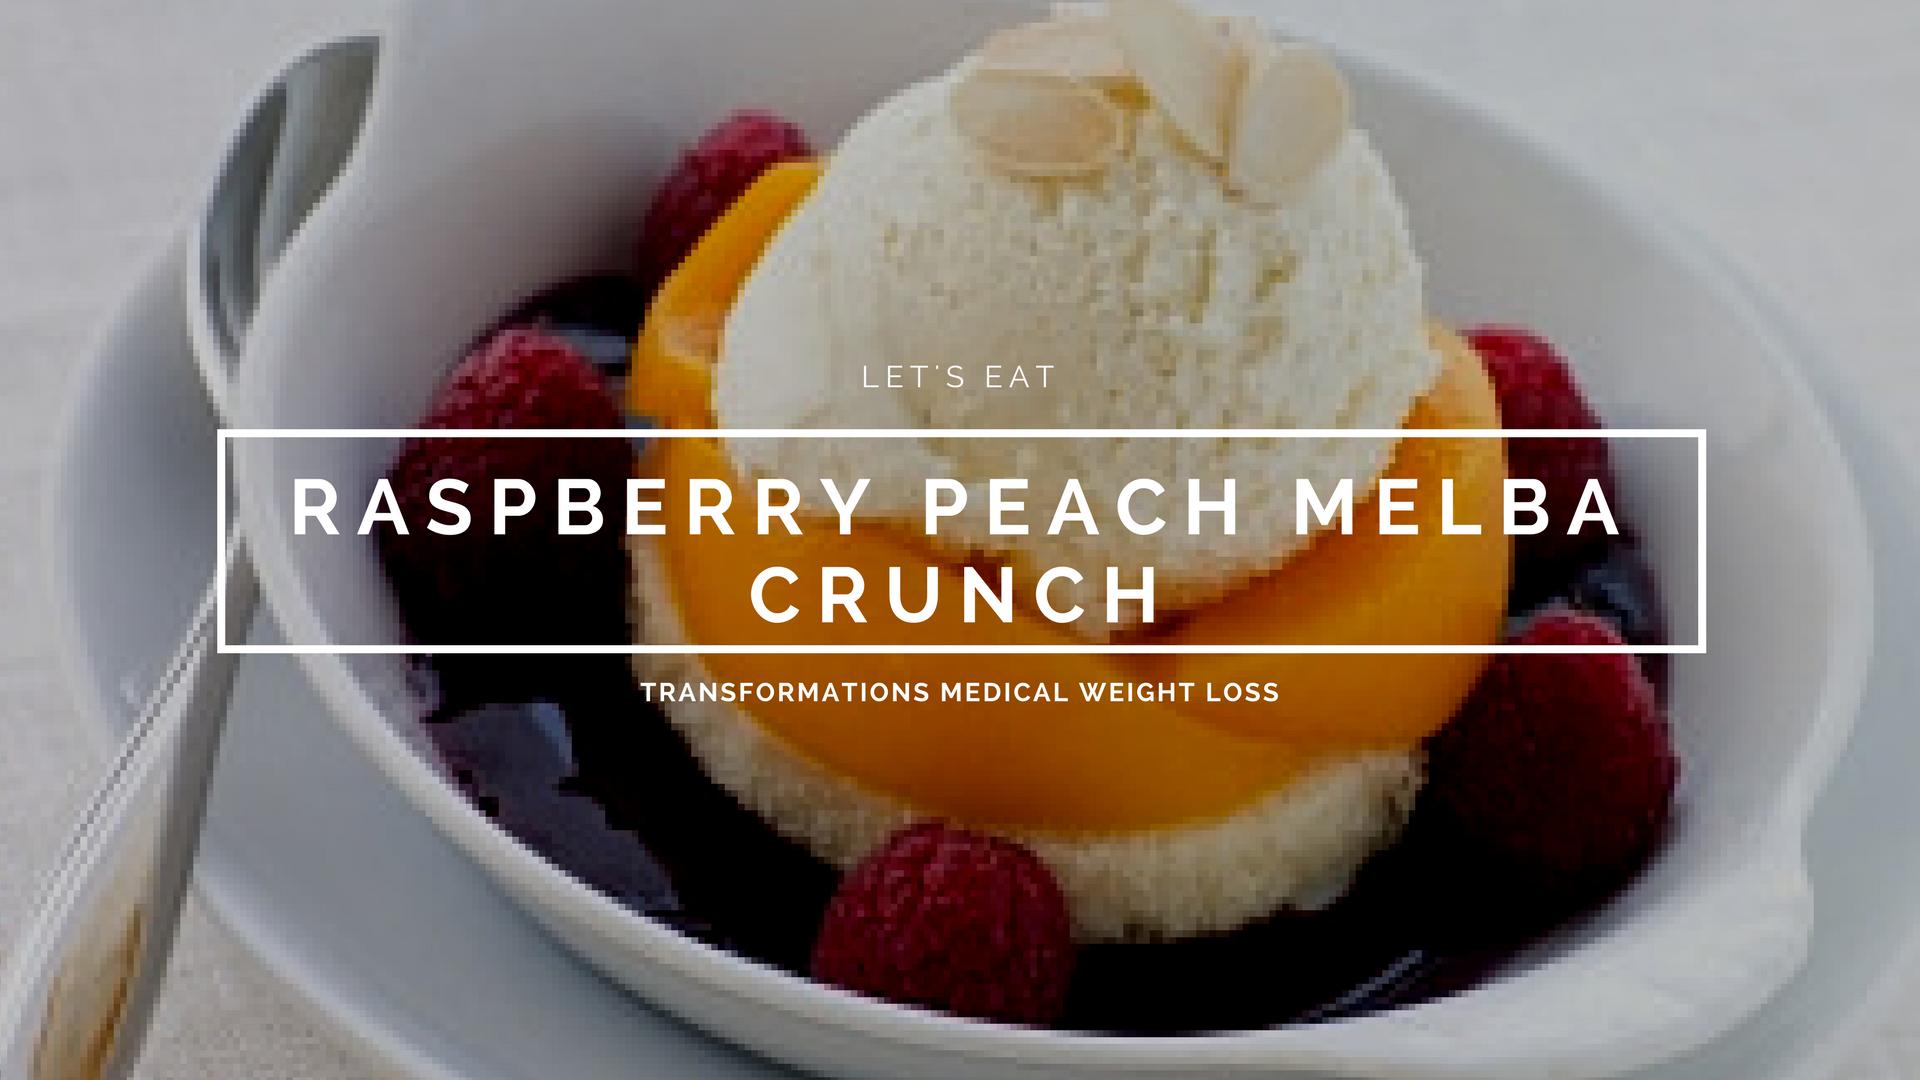 Raspberry Peach Melba Crunch